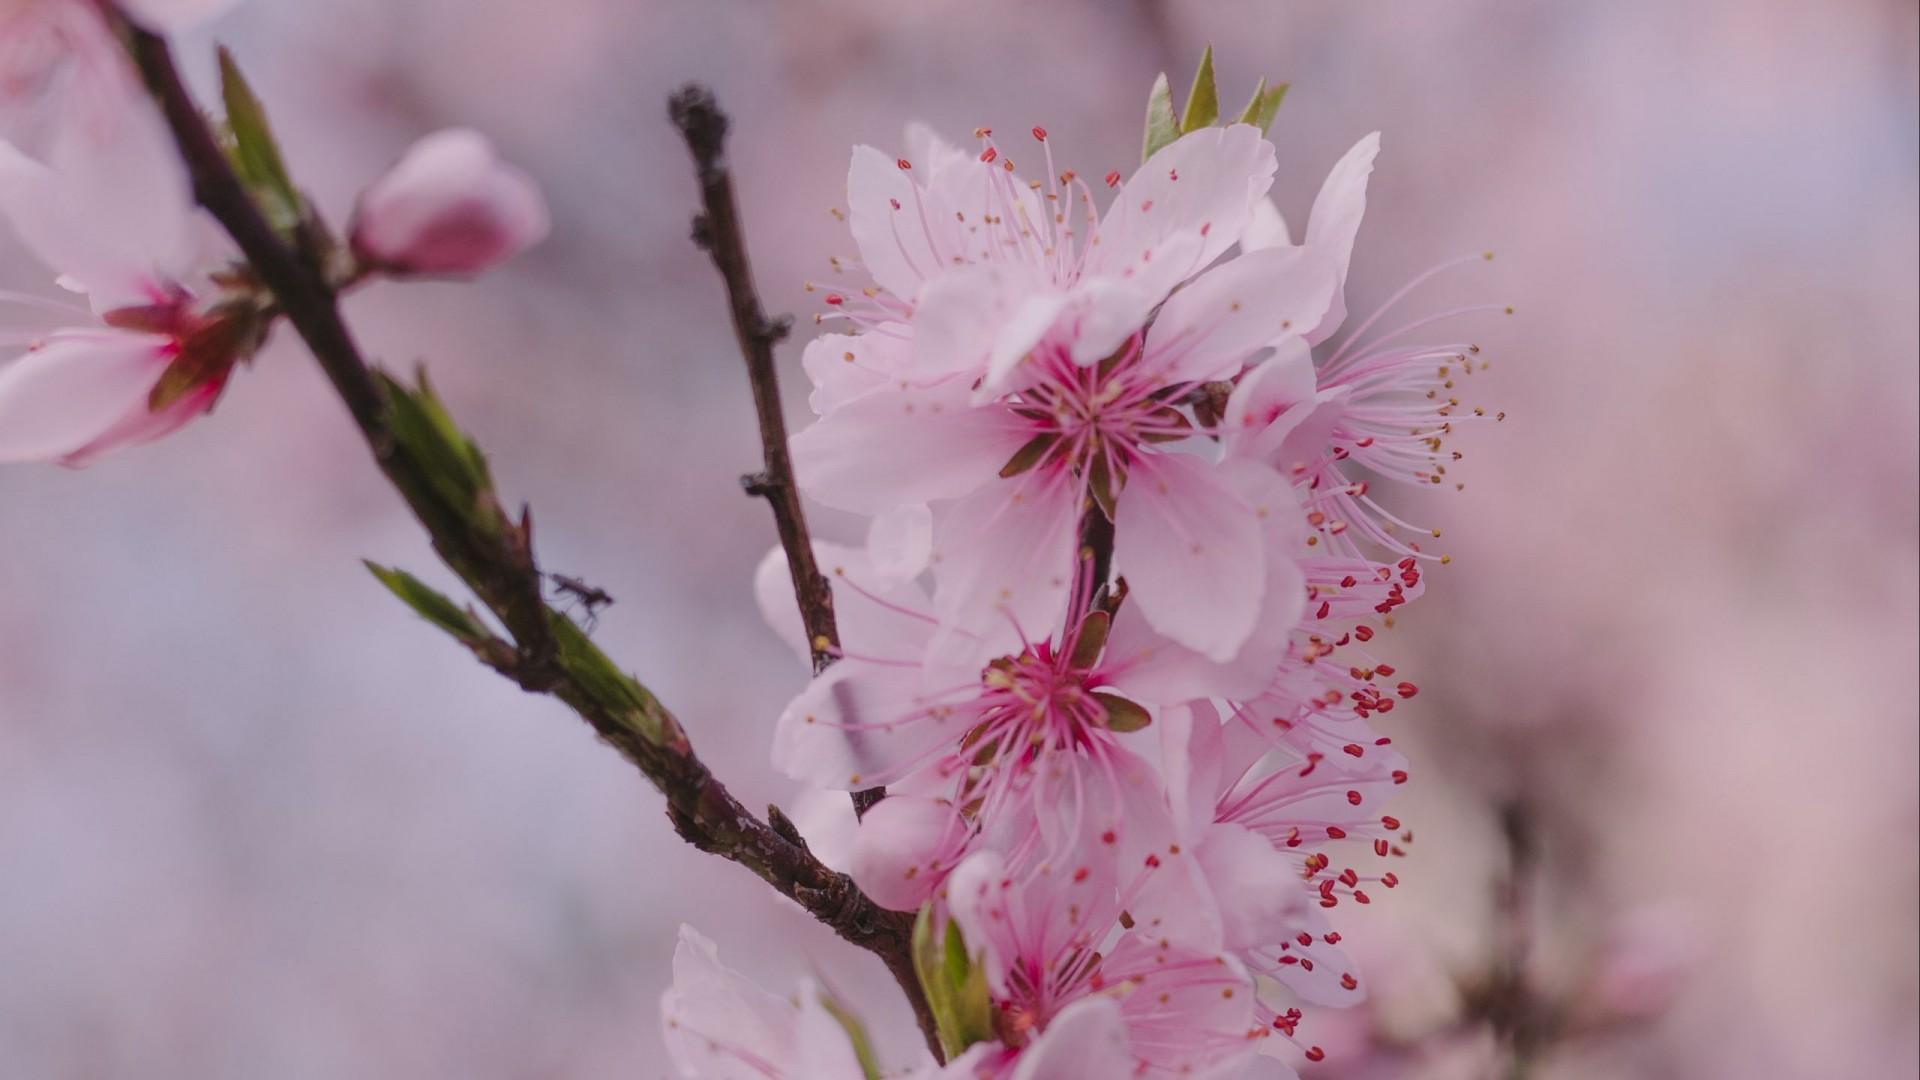 Pink Sakura Flowers Petals HD Wallpaper